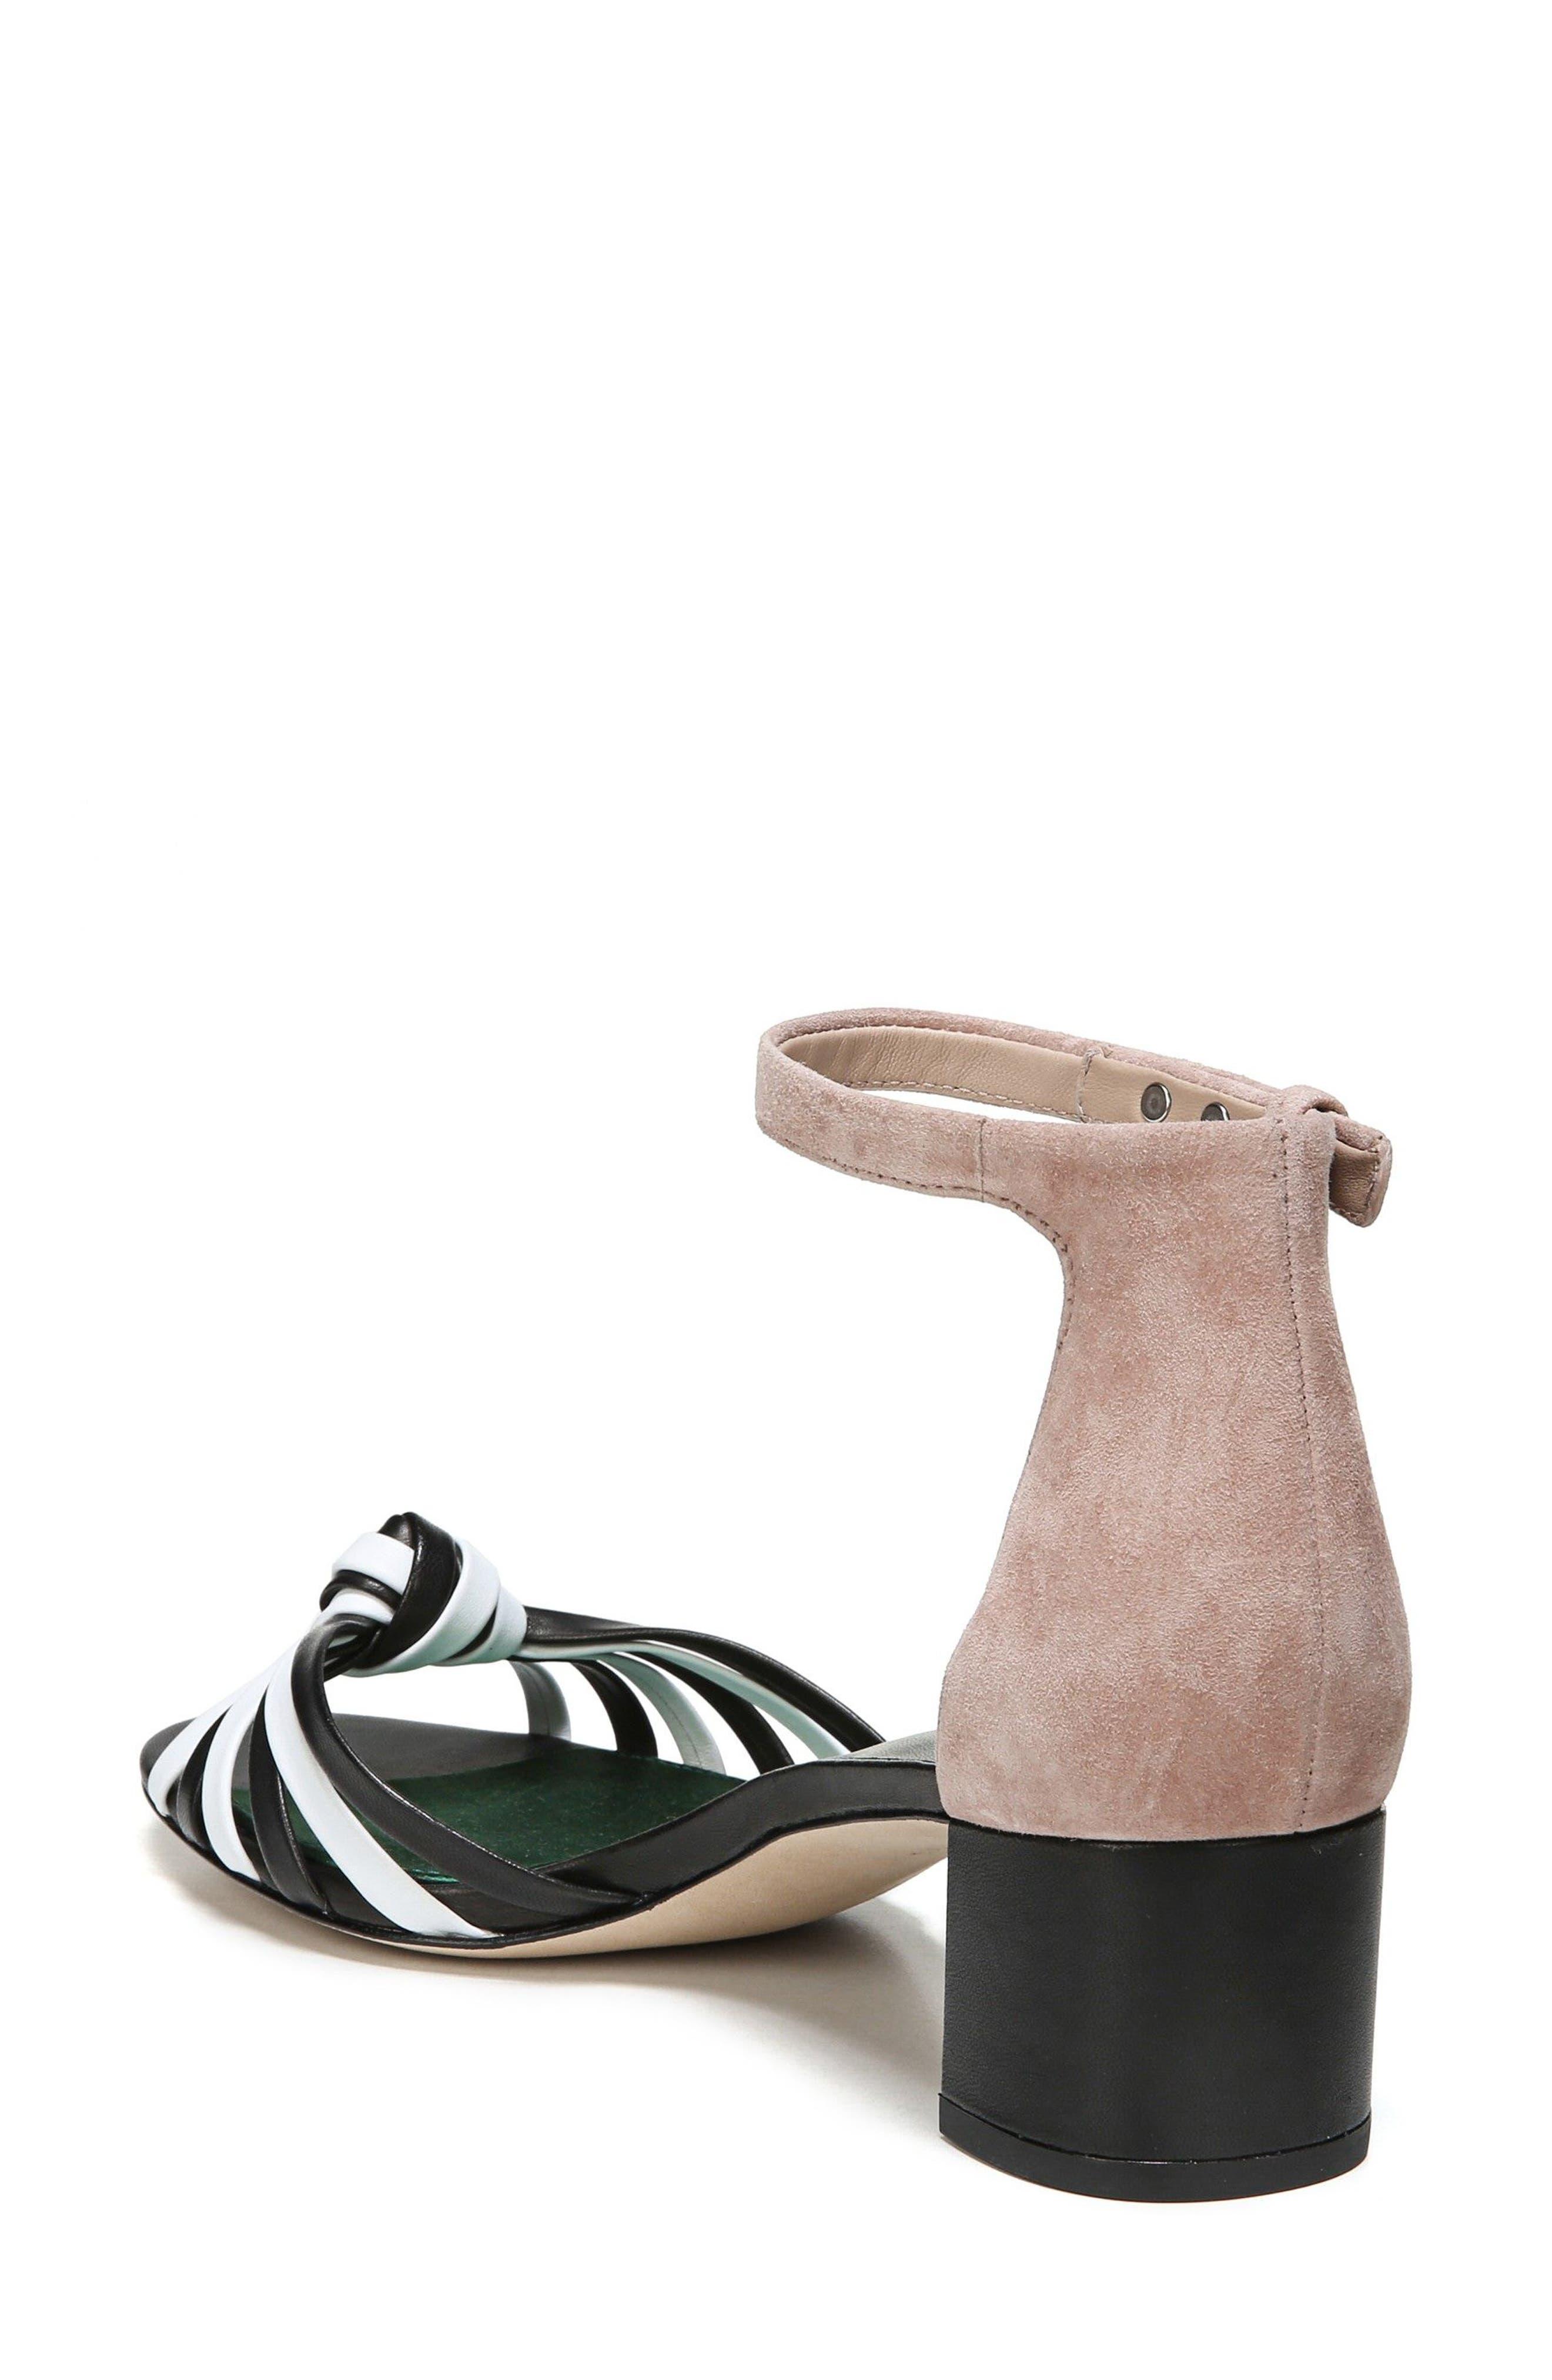 Fonseca Ankle Strap Sandal,                             Alternate thumbnail 2, color,                             001